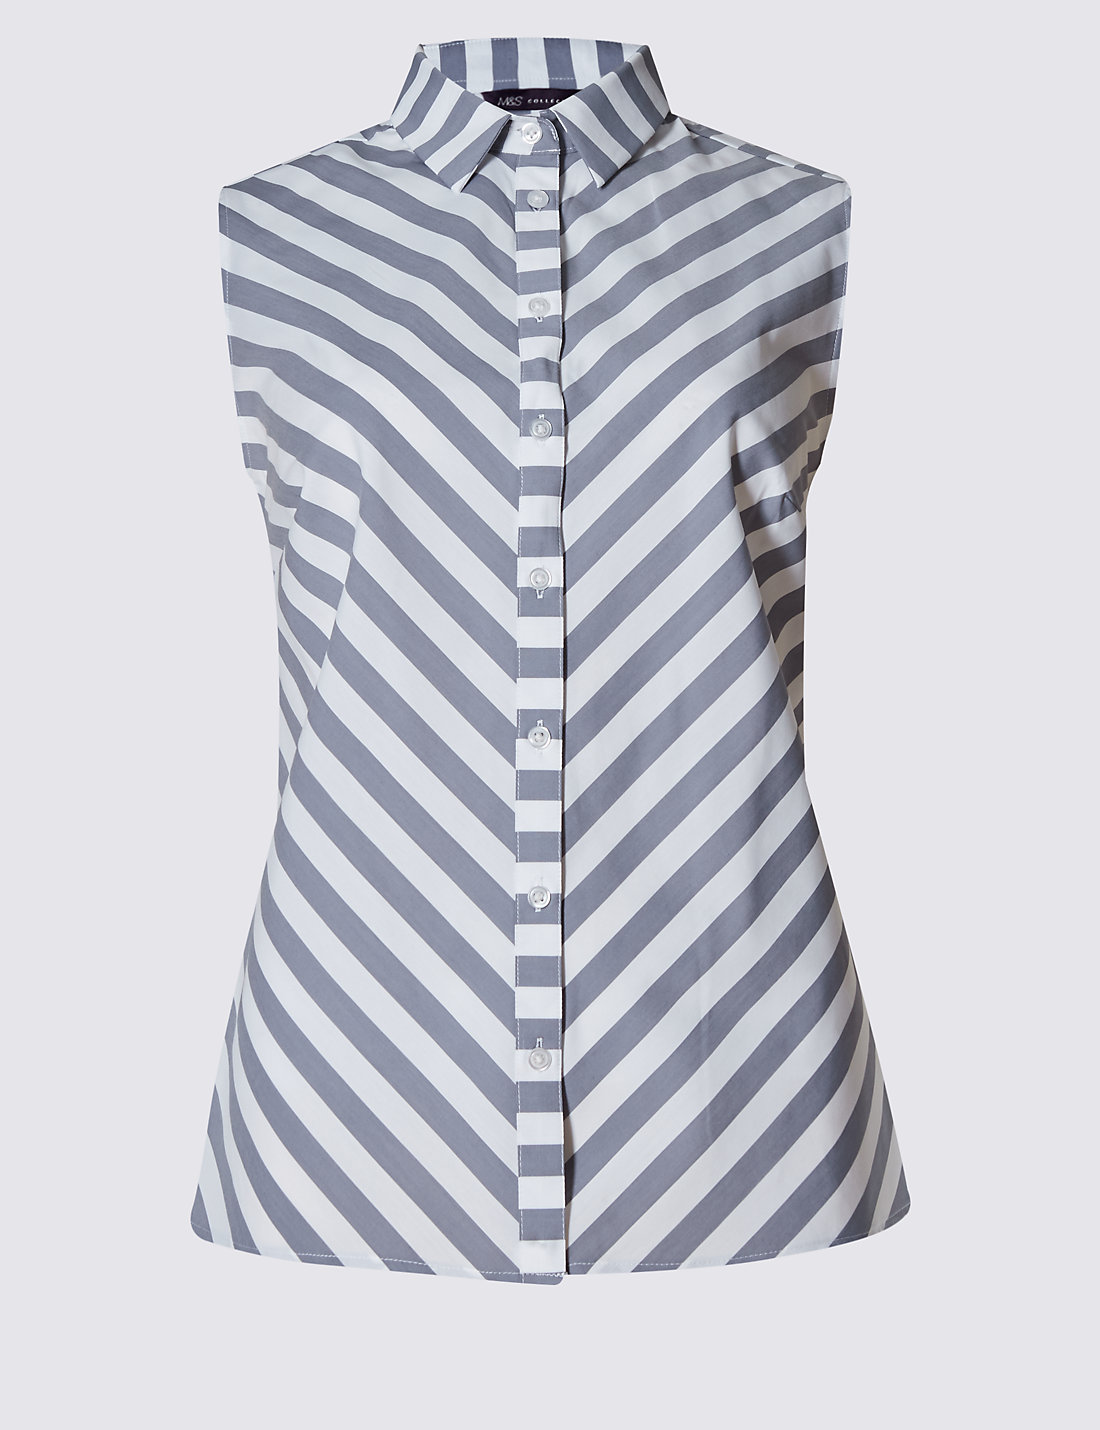 Chevron Striped Shirt